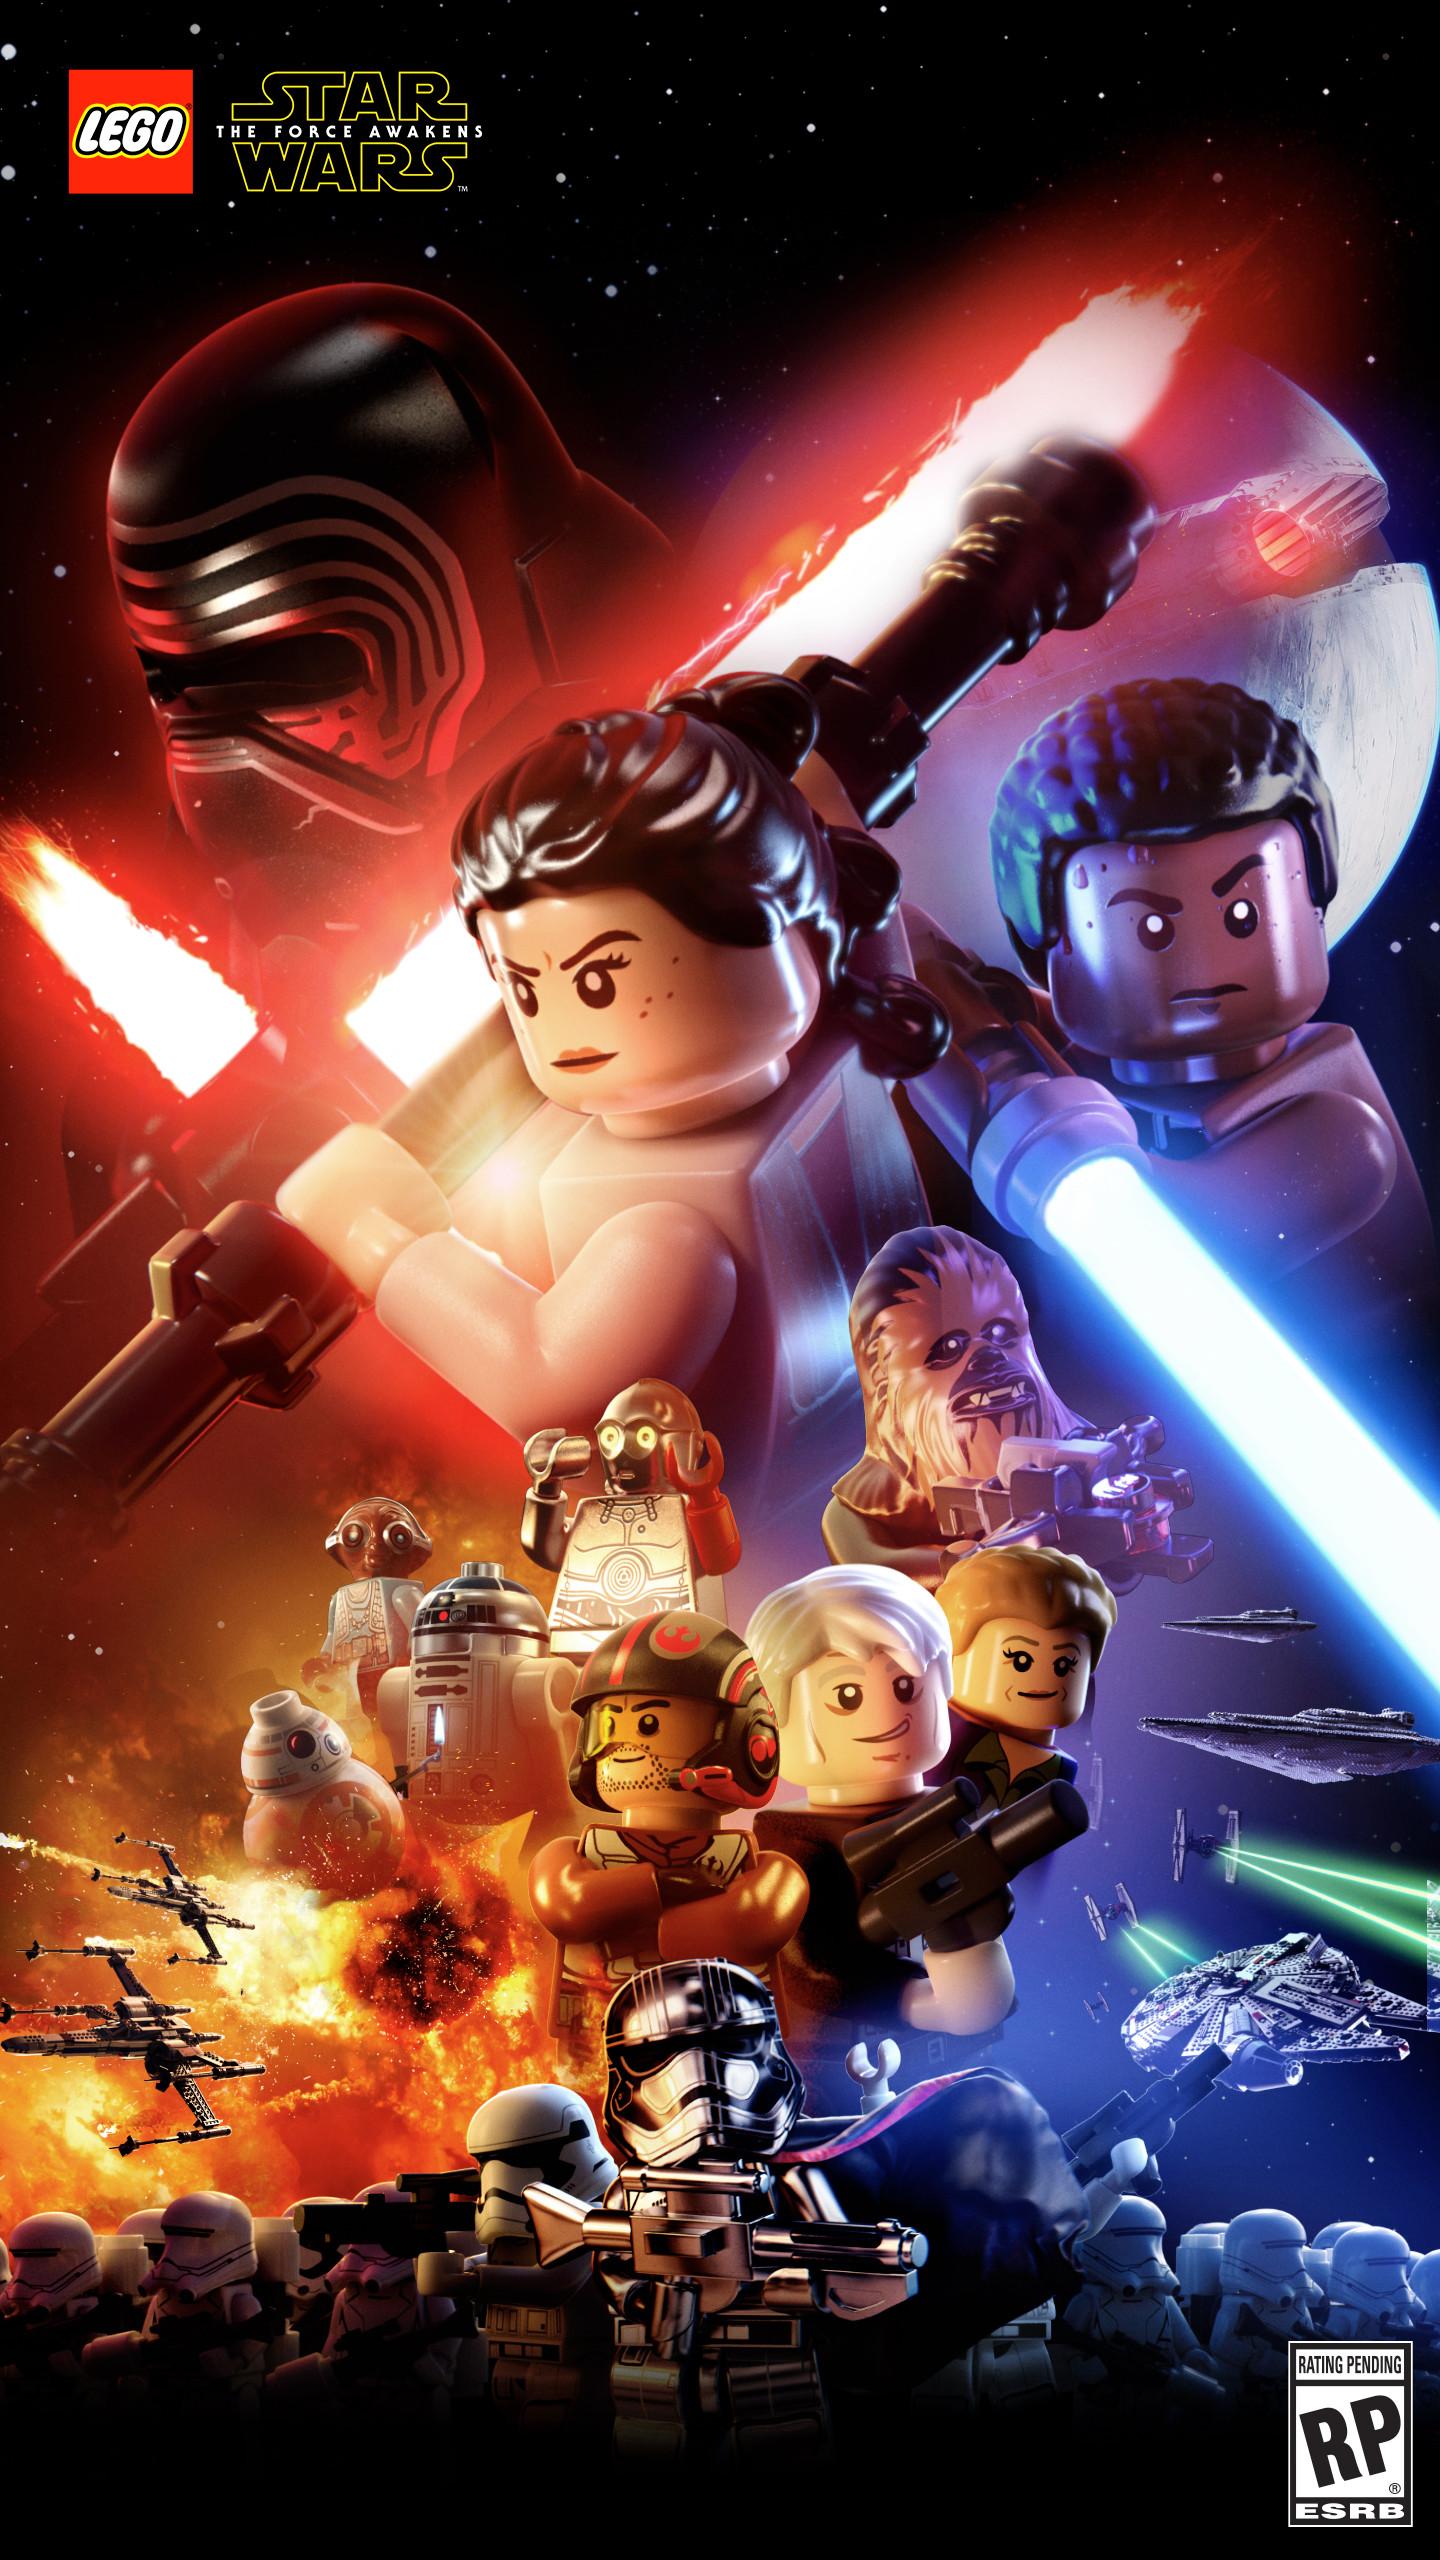 Lego Star Wars Wallpaper Wallpapertag